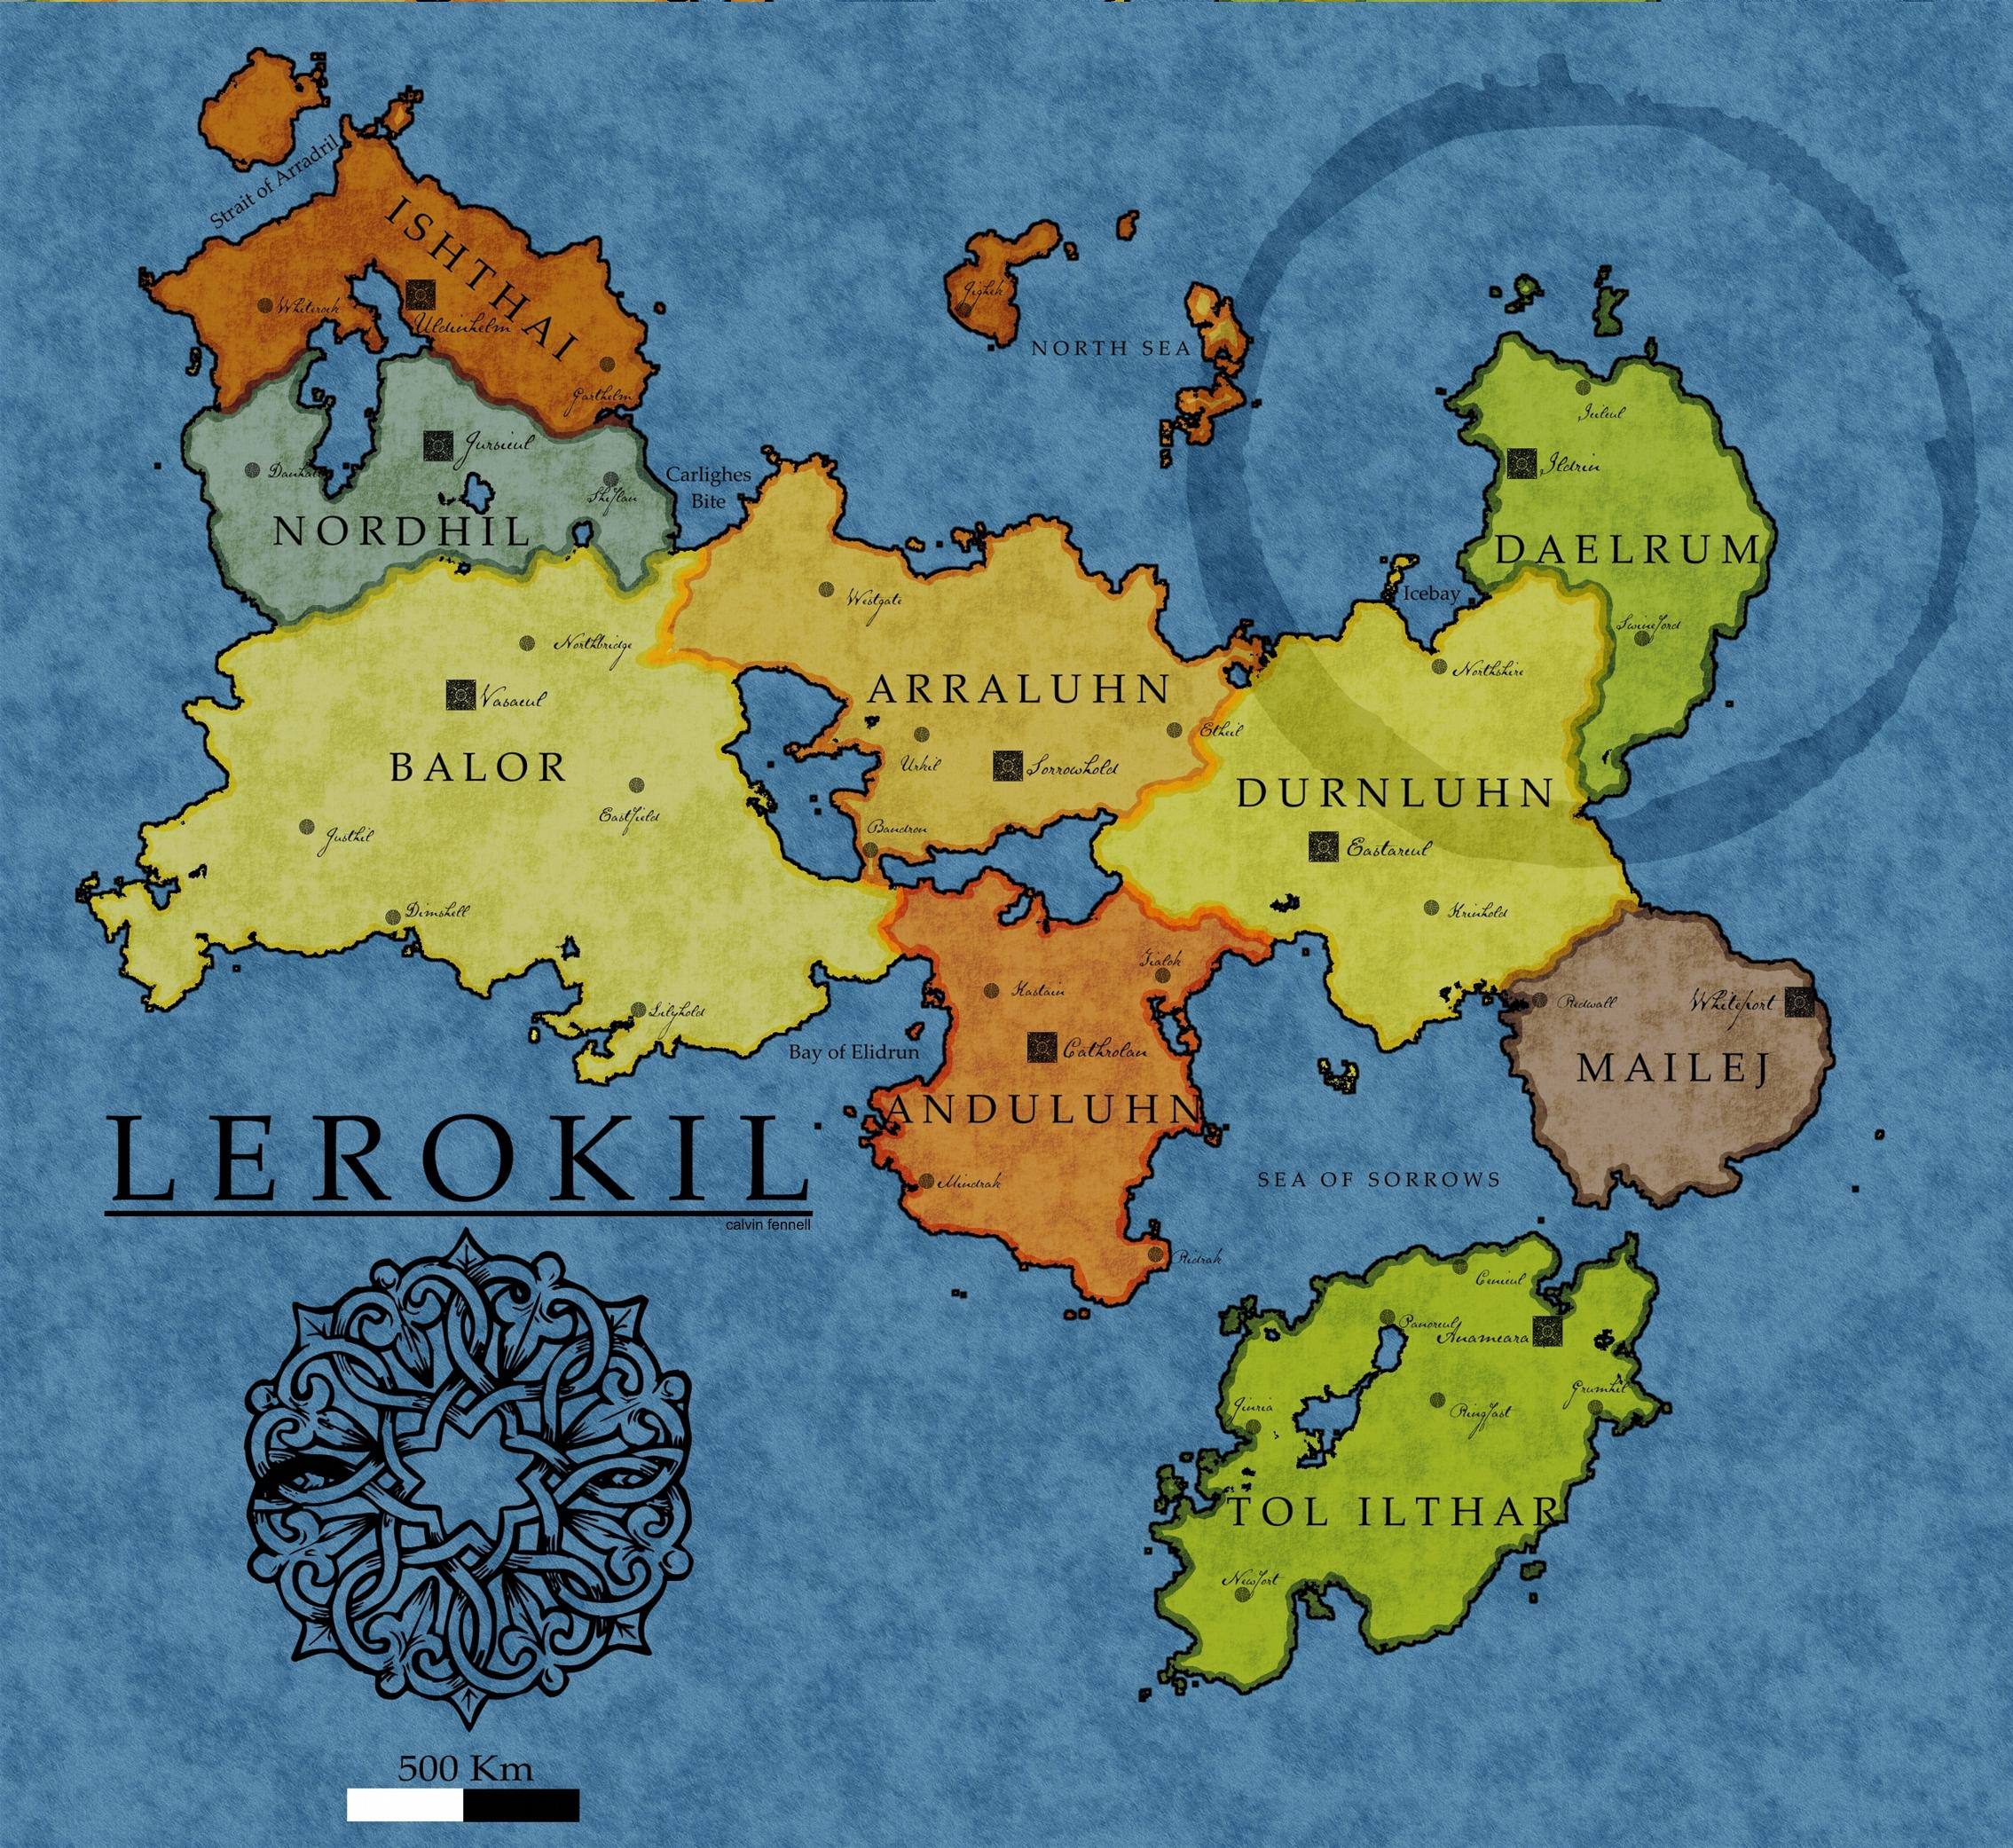 Lerokil